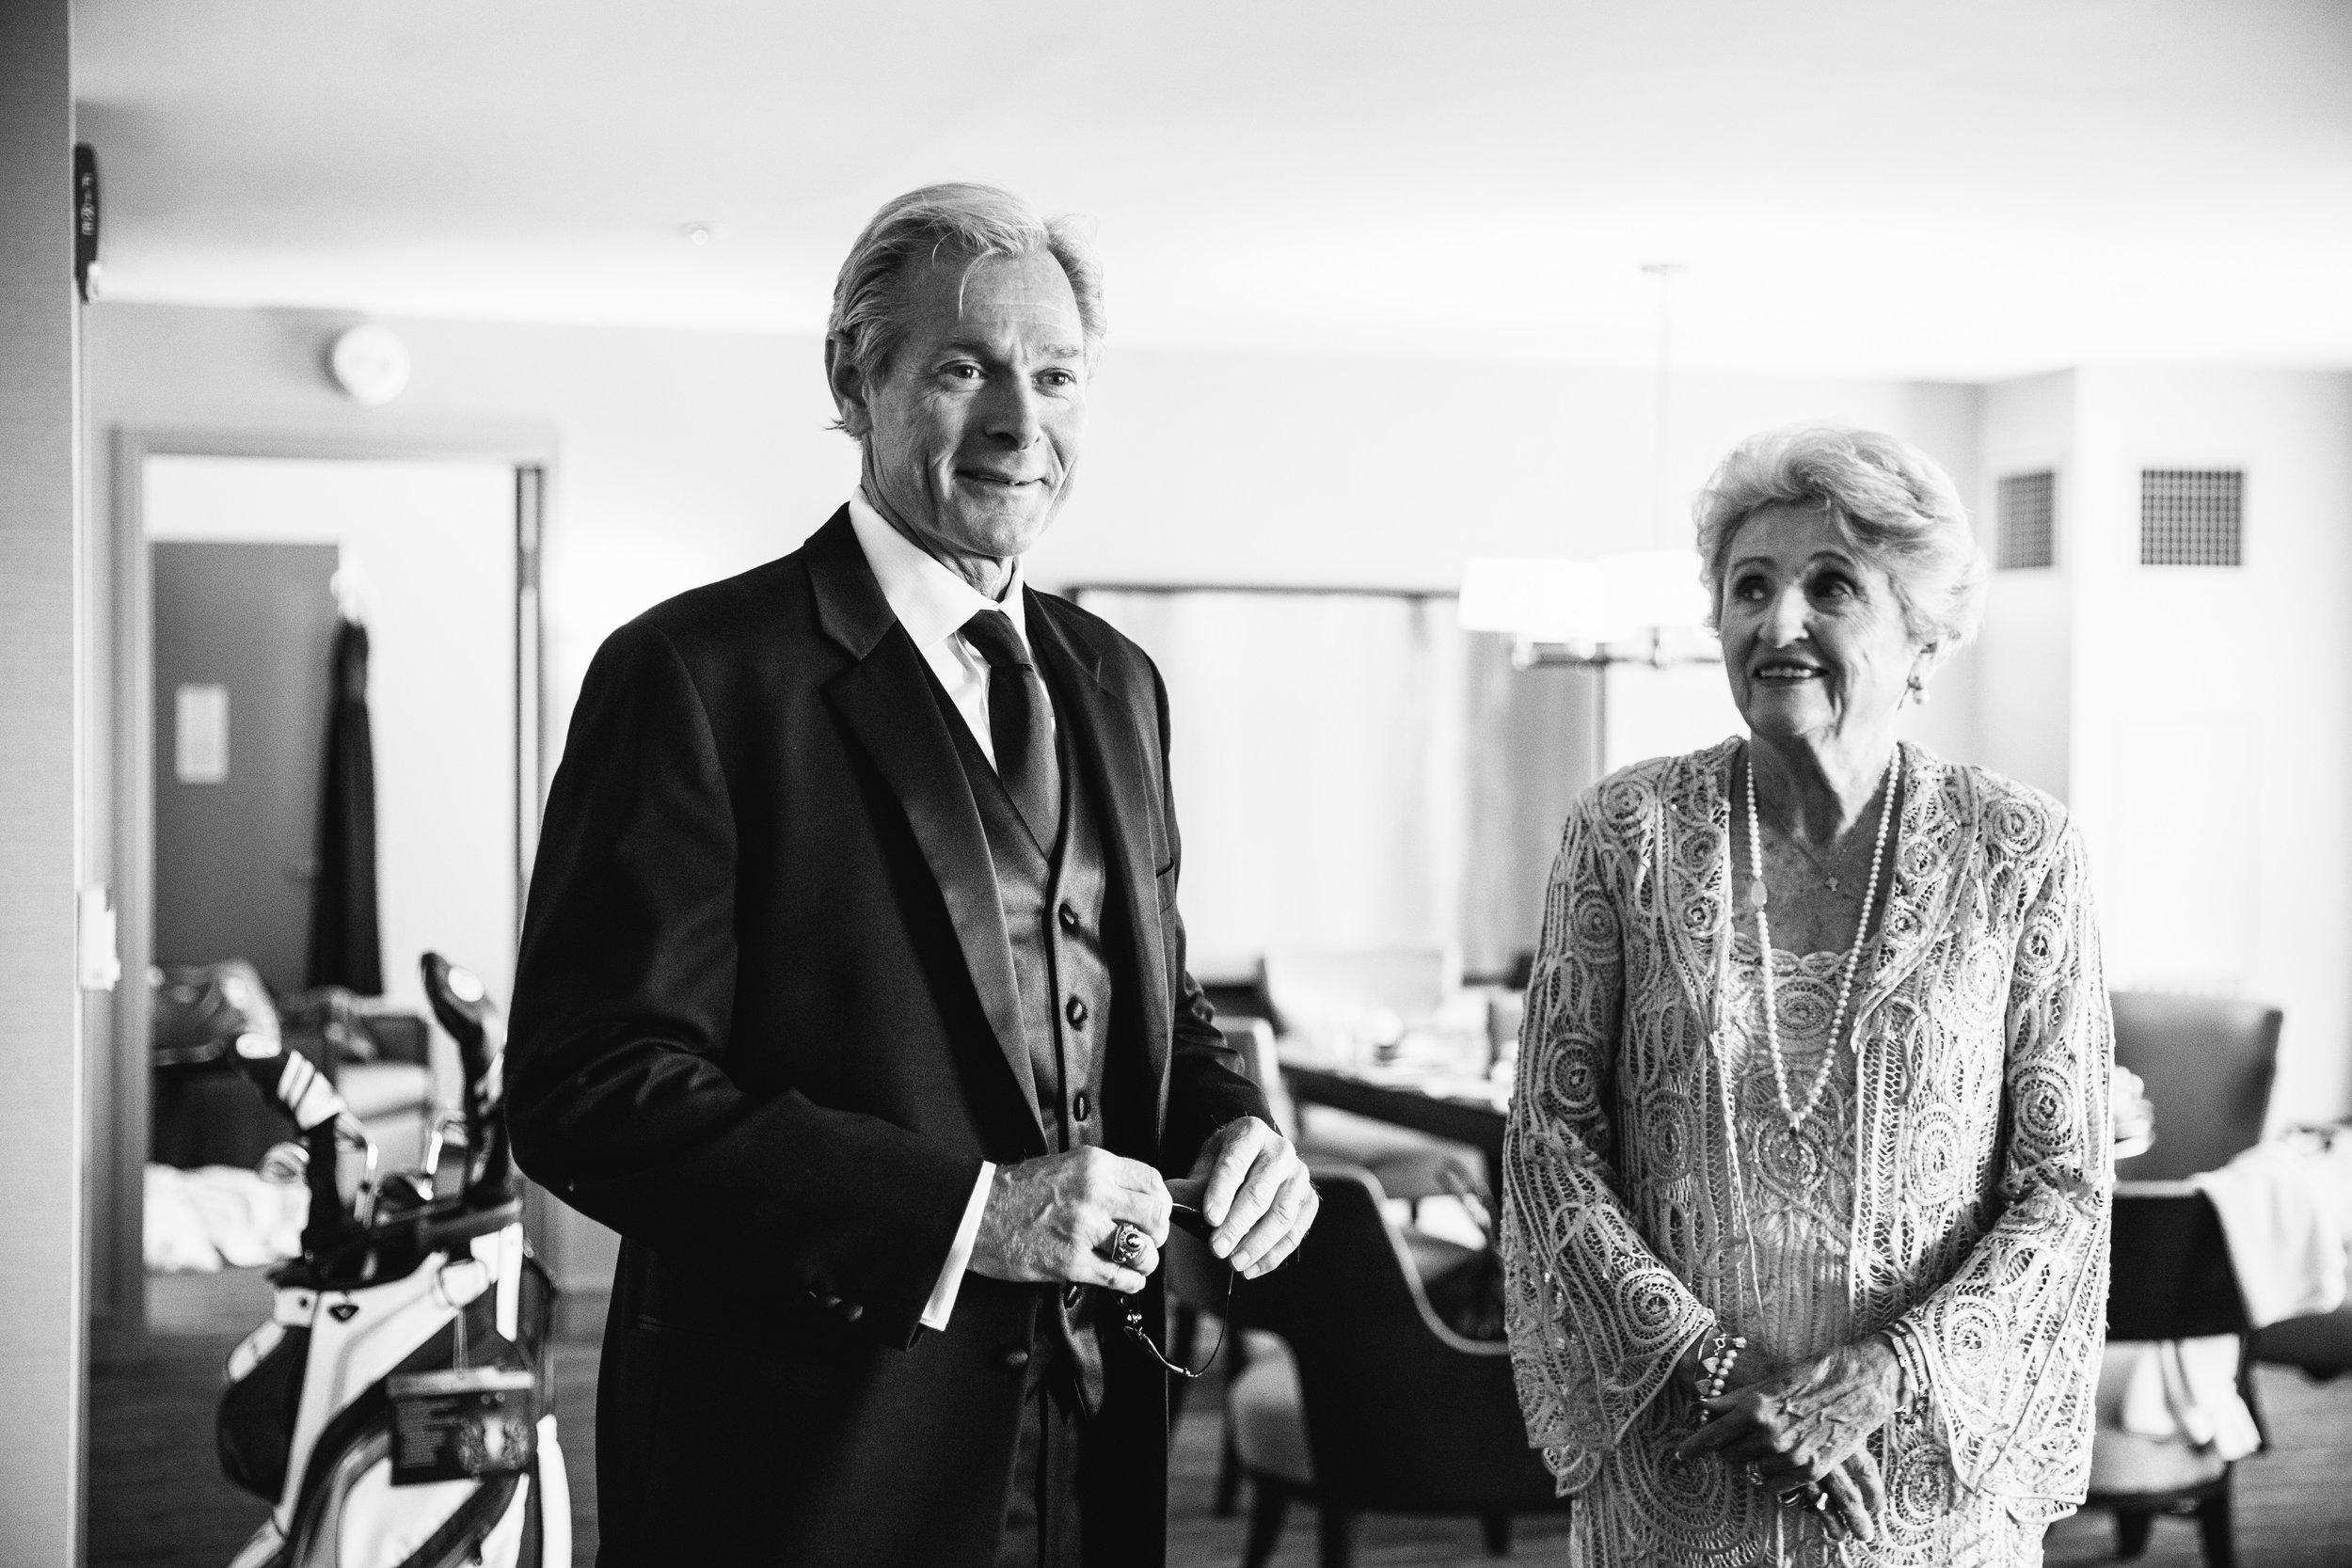 065-Governor-Calvert-Annapolis-Maryland-Wedding-MA17.jpg